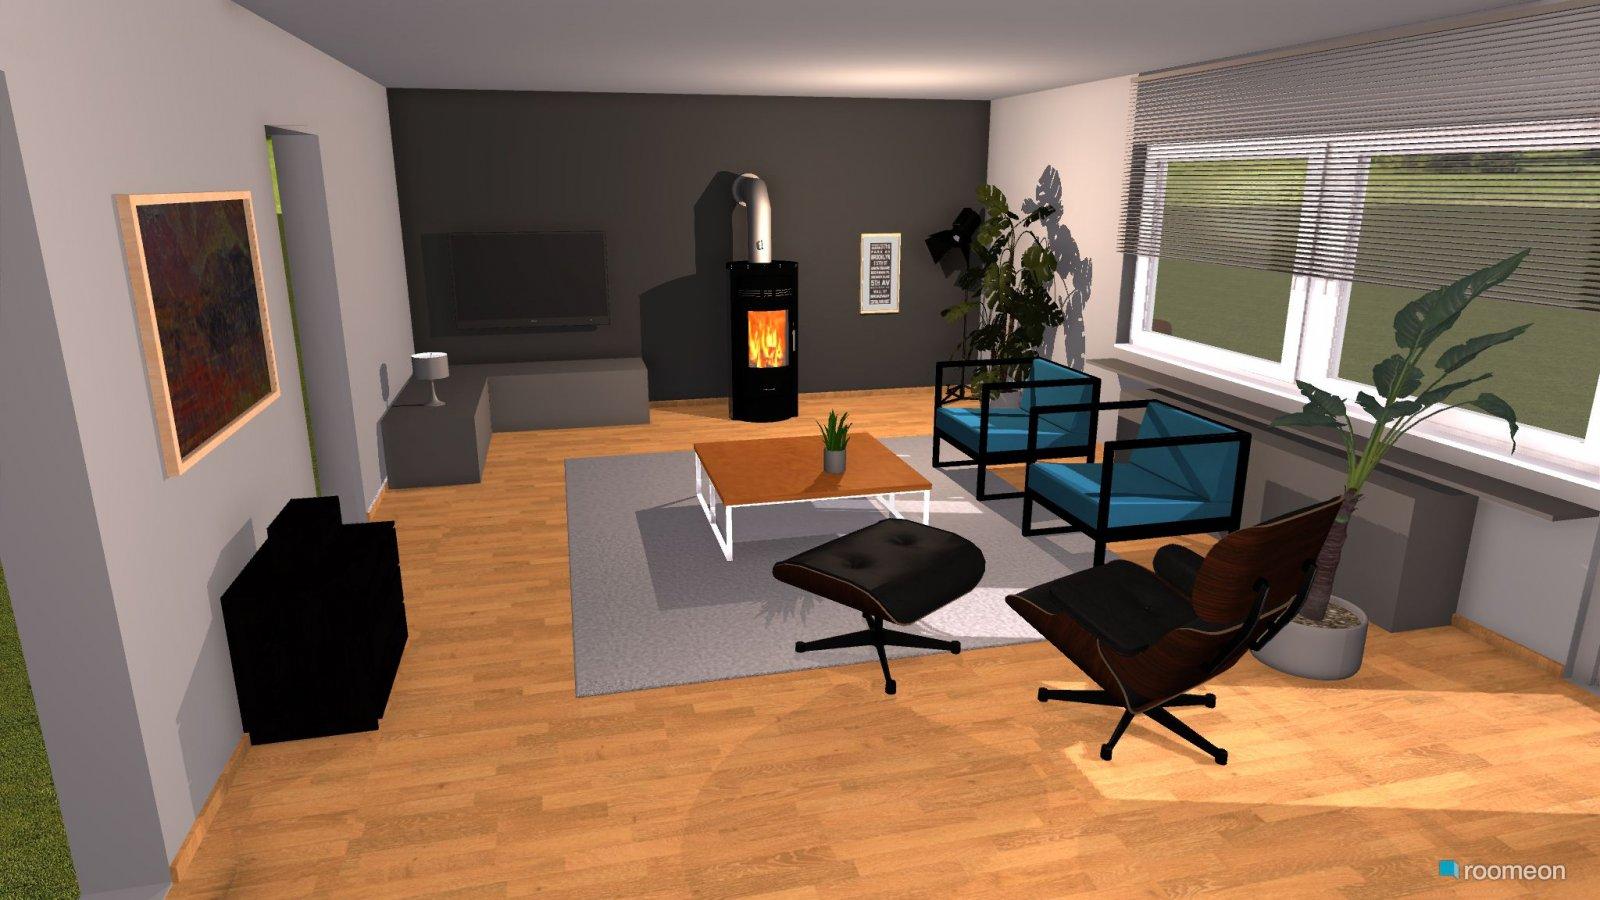 Room Design Wohnzimmer ohne Sofa - roomeon Community